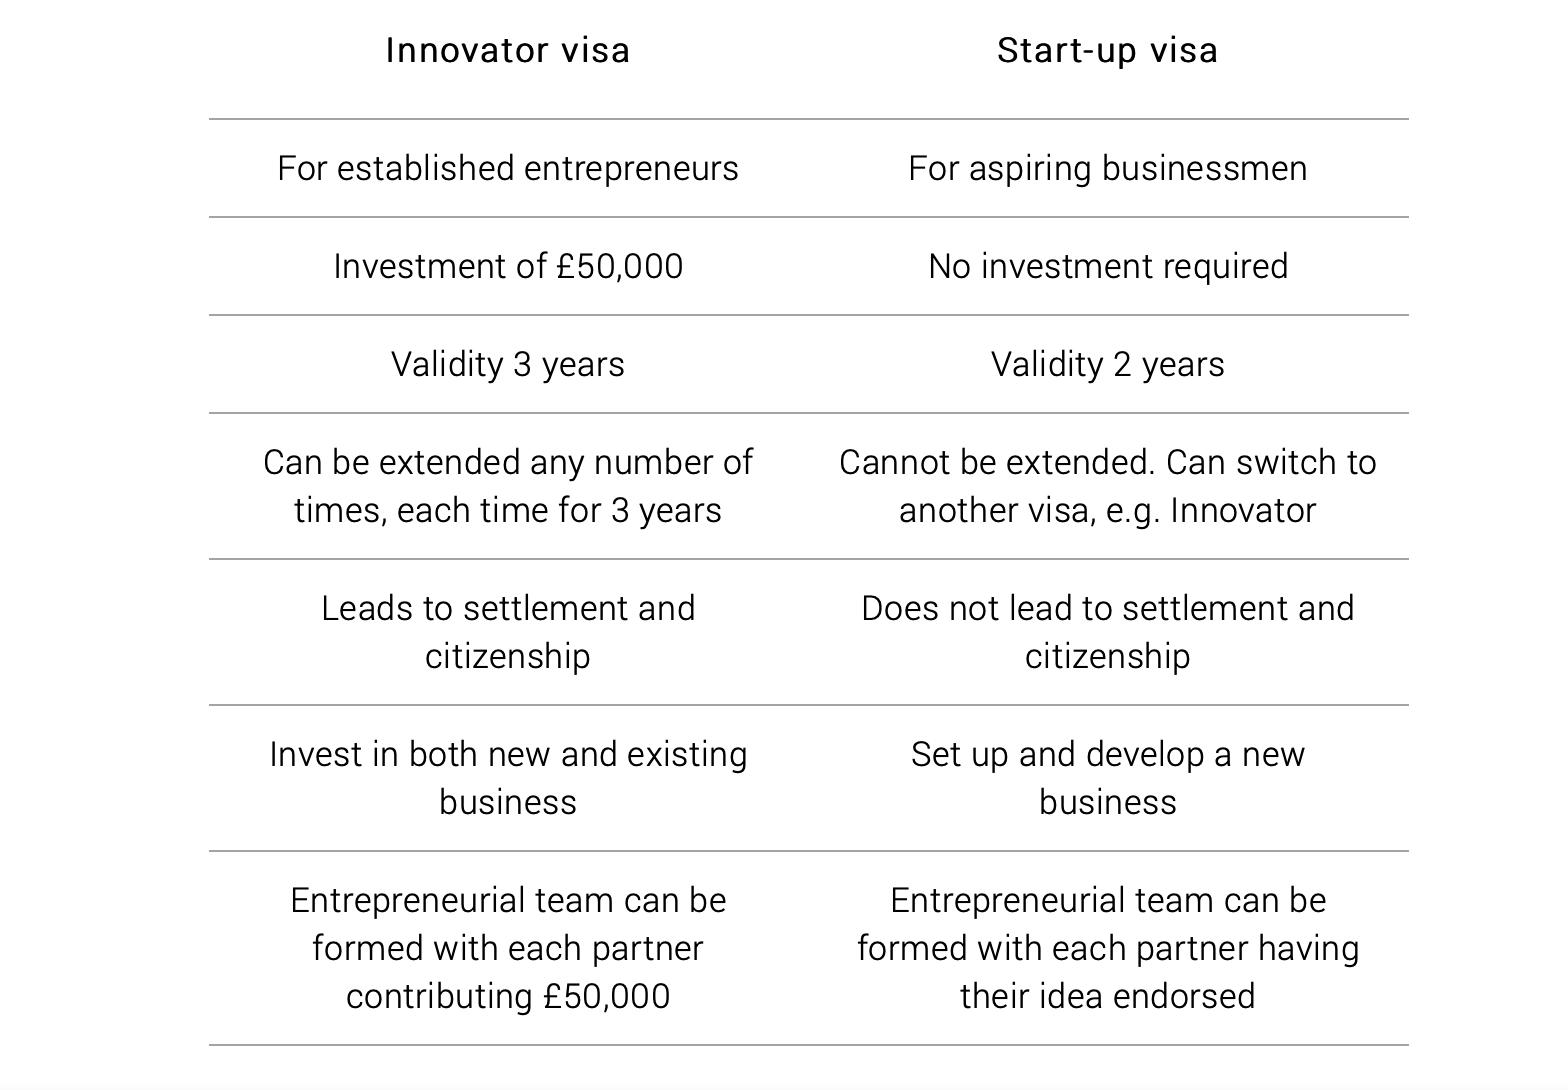 innovator and start up visa